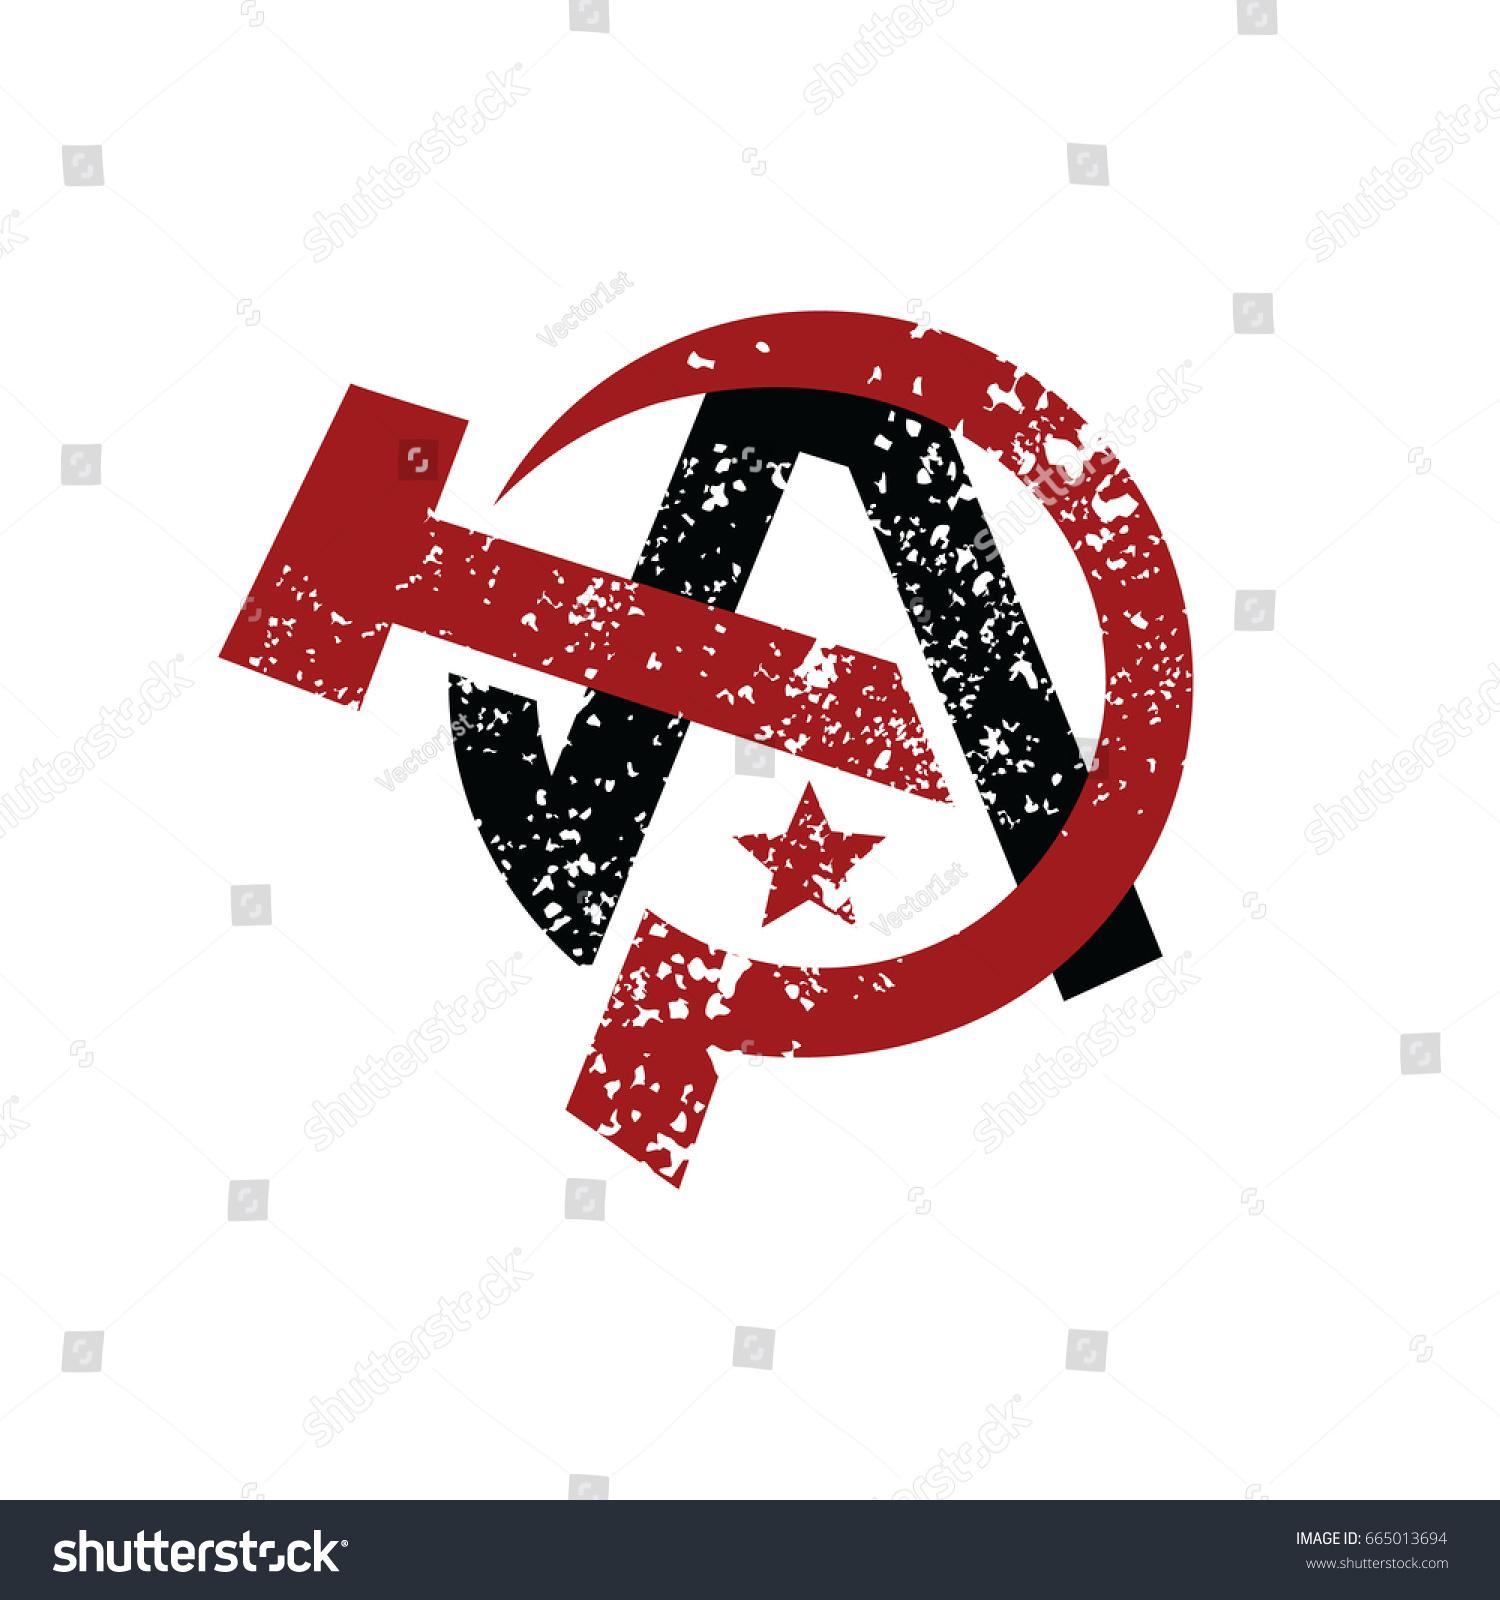 Anarchy atheism communist logo logotype vector stock vector anarchy atheism communist logo logotype vector art biocorpaavc Choice Image